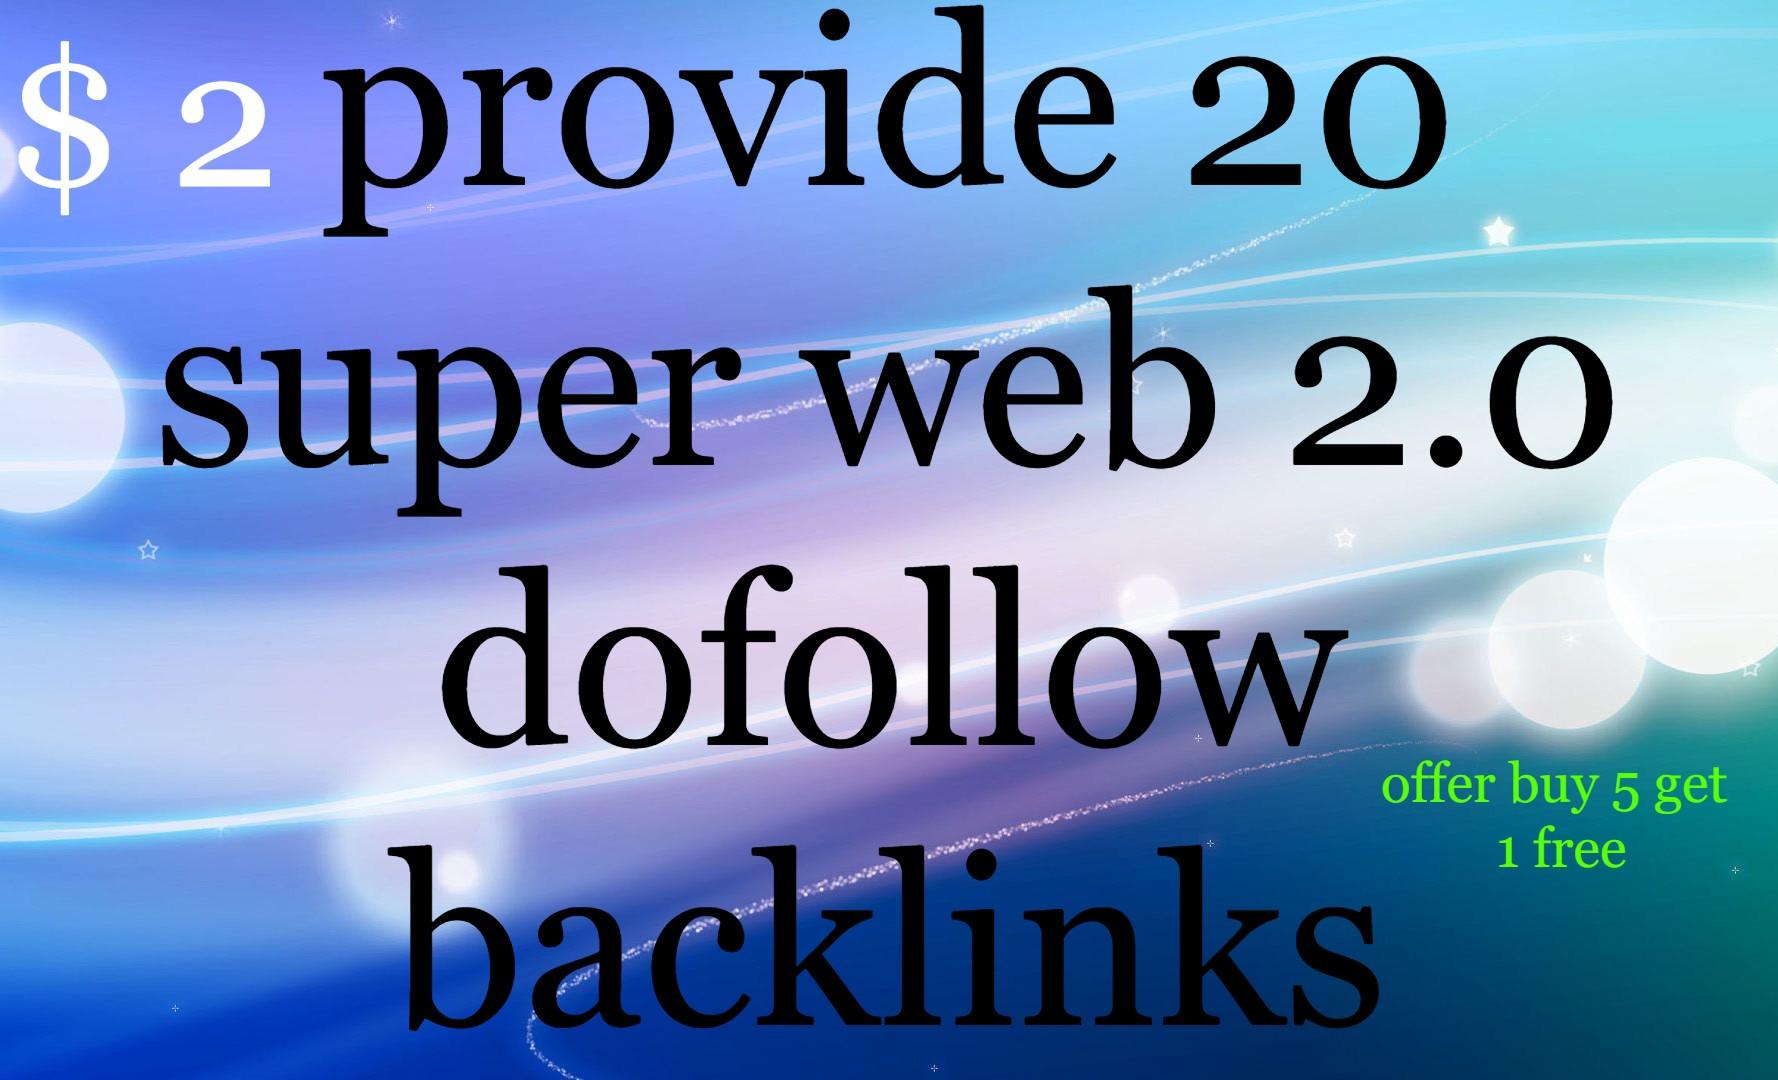 I will provide 20 super web 2.0 dofollow backlinks